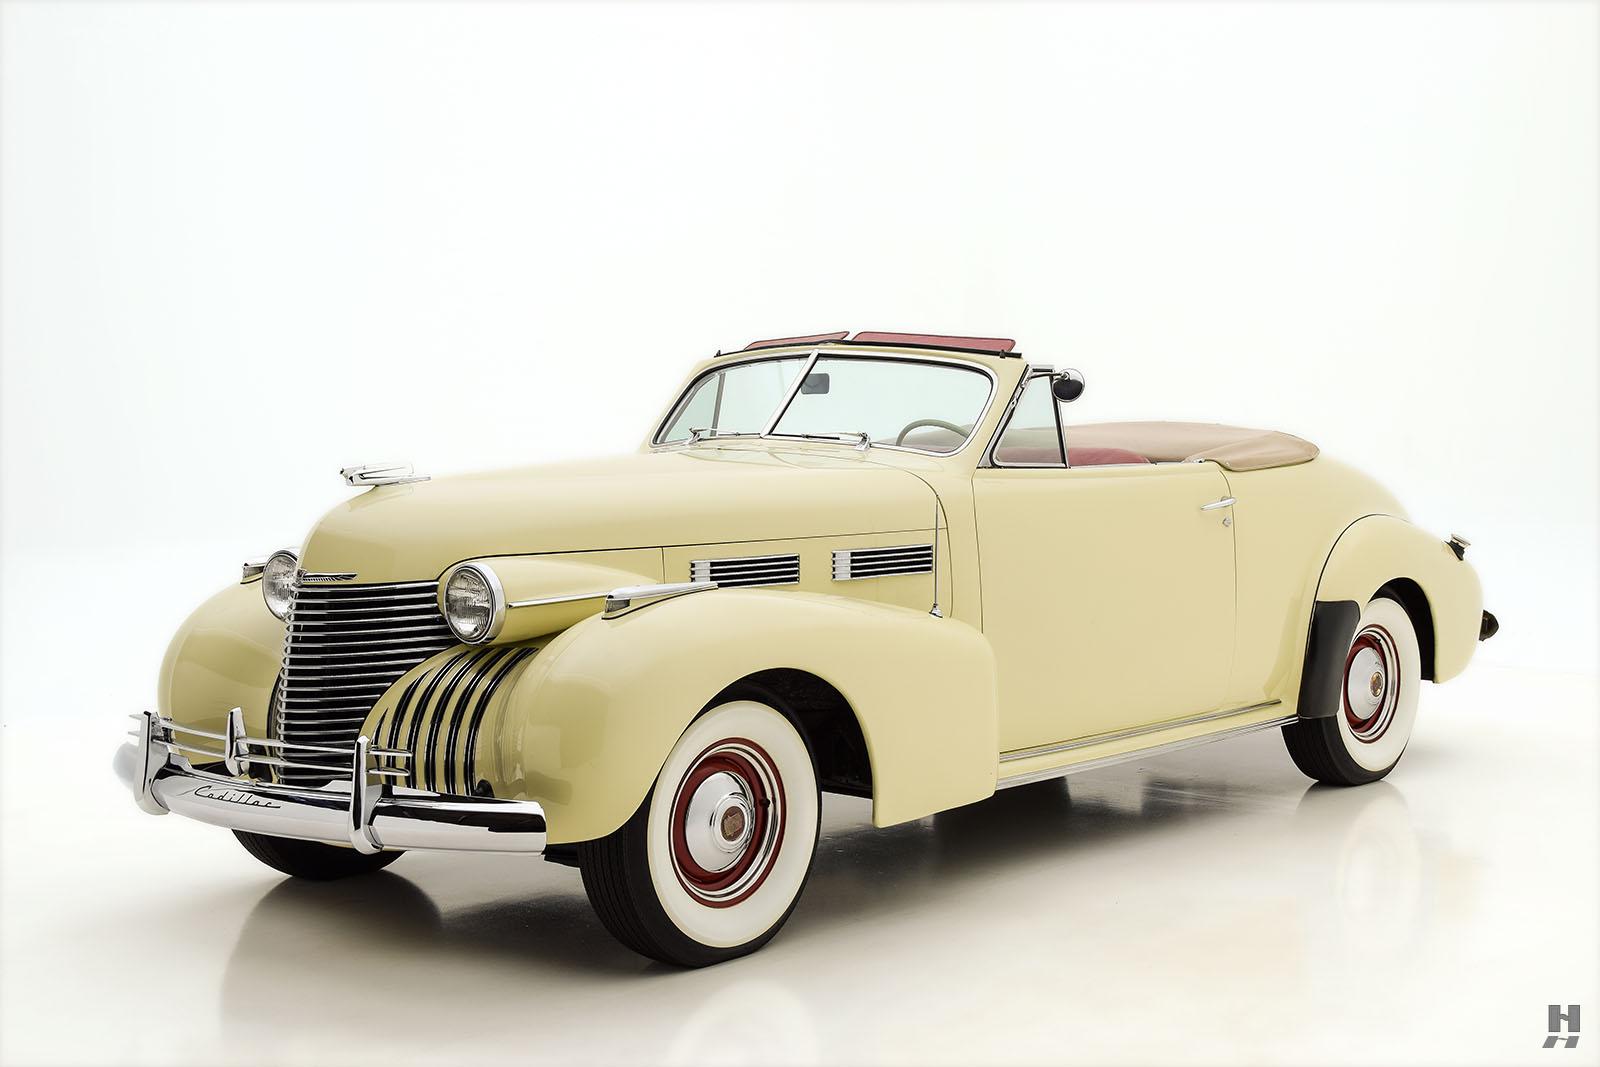 Cadillac Series 62 I 1940 - 1941 Cabriolet #2